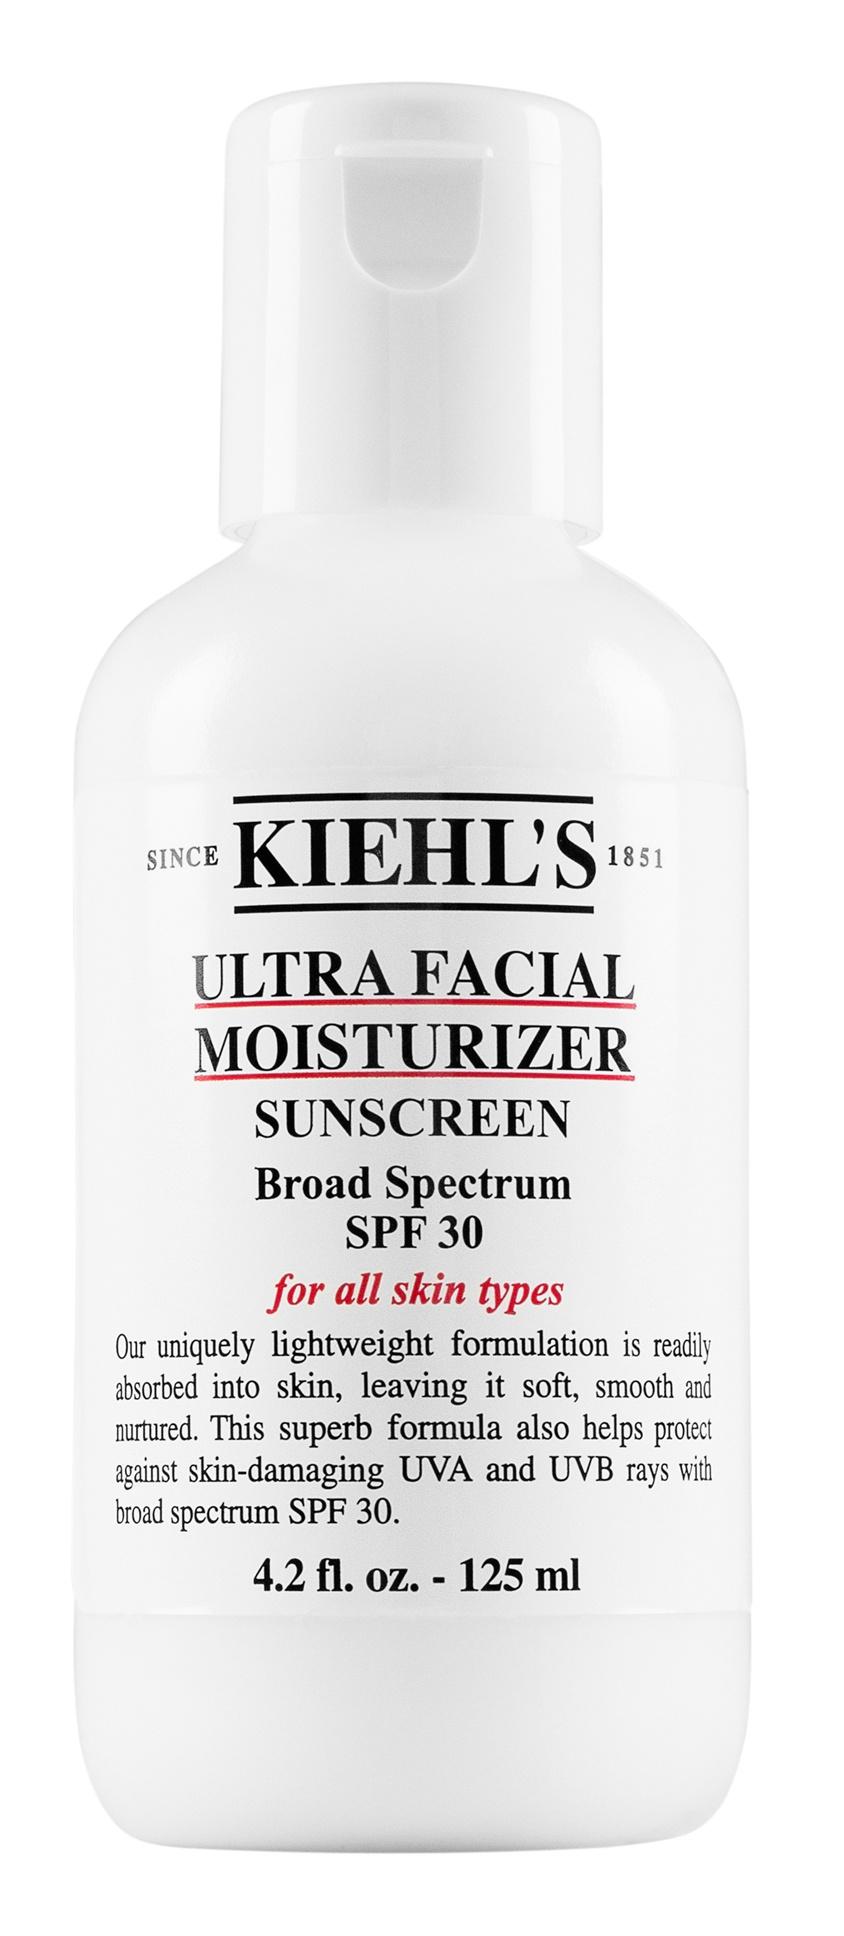 Kiehl's Ultra Facial Moisturizer Spf 30